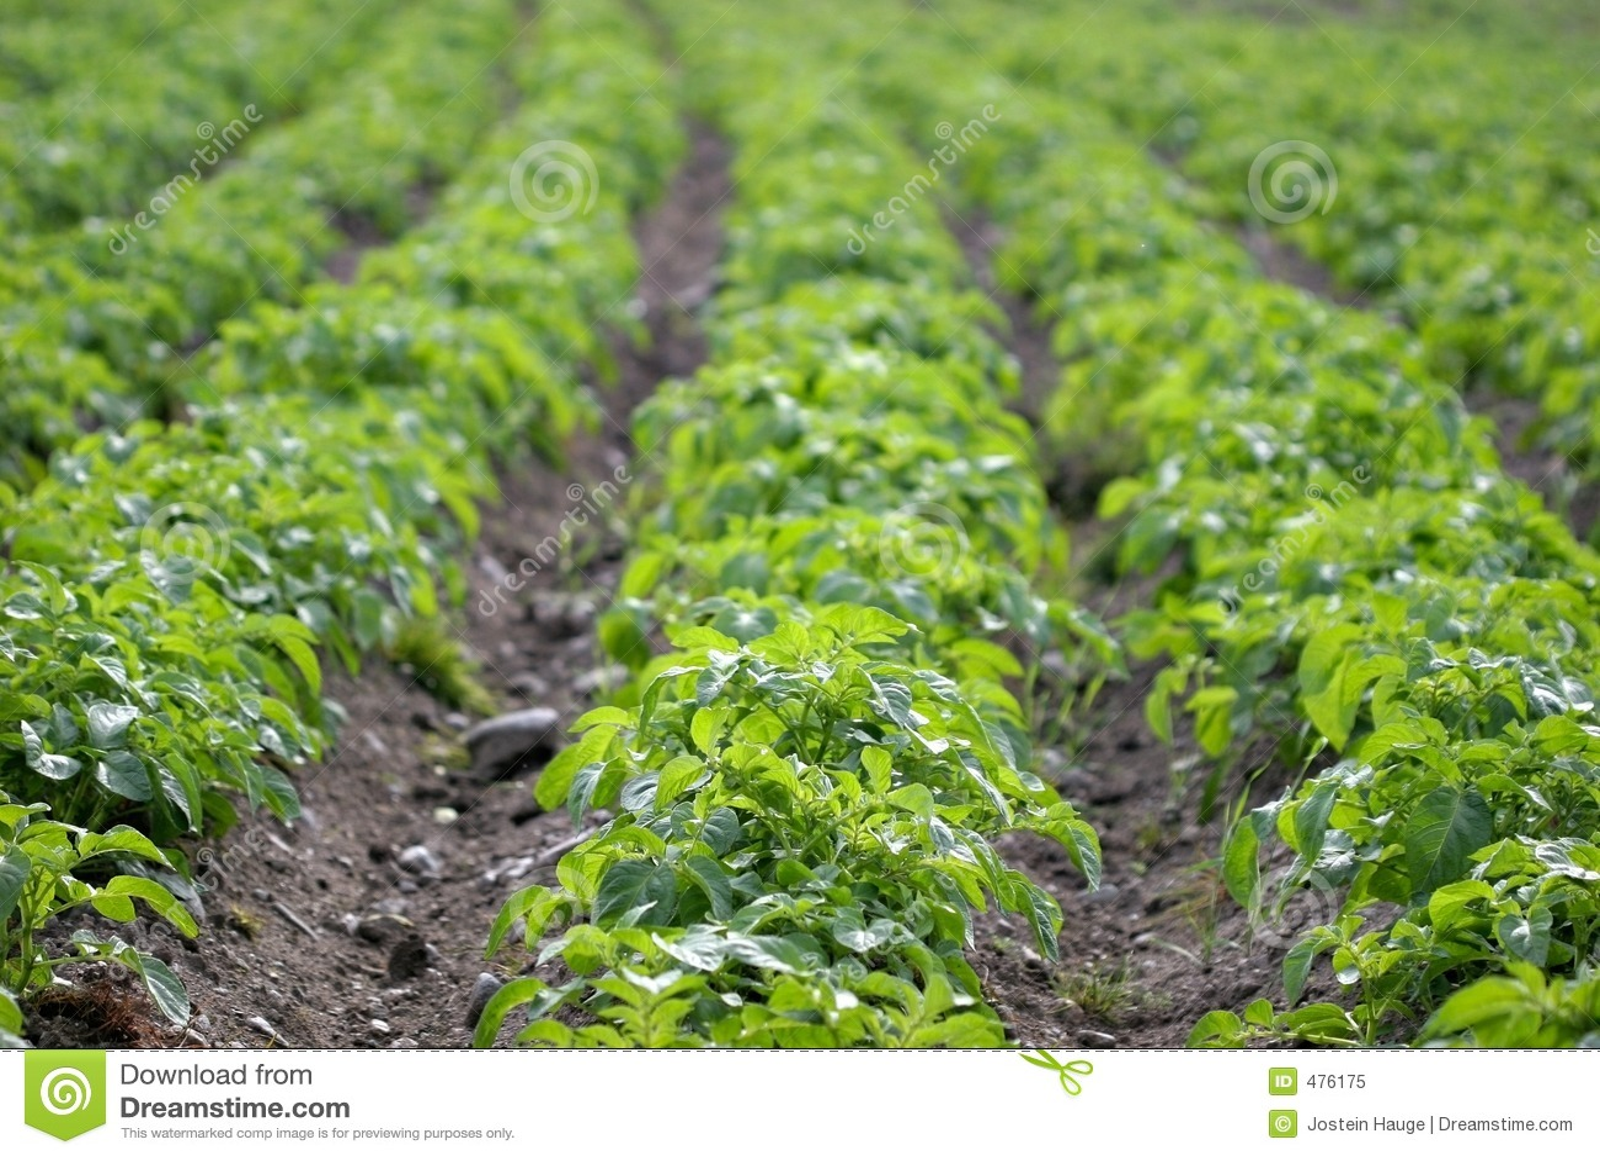 рядки картошки